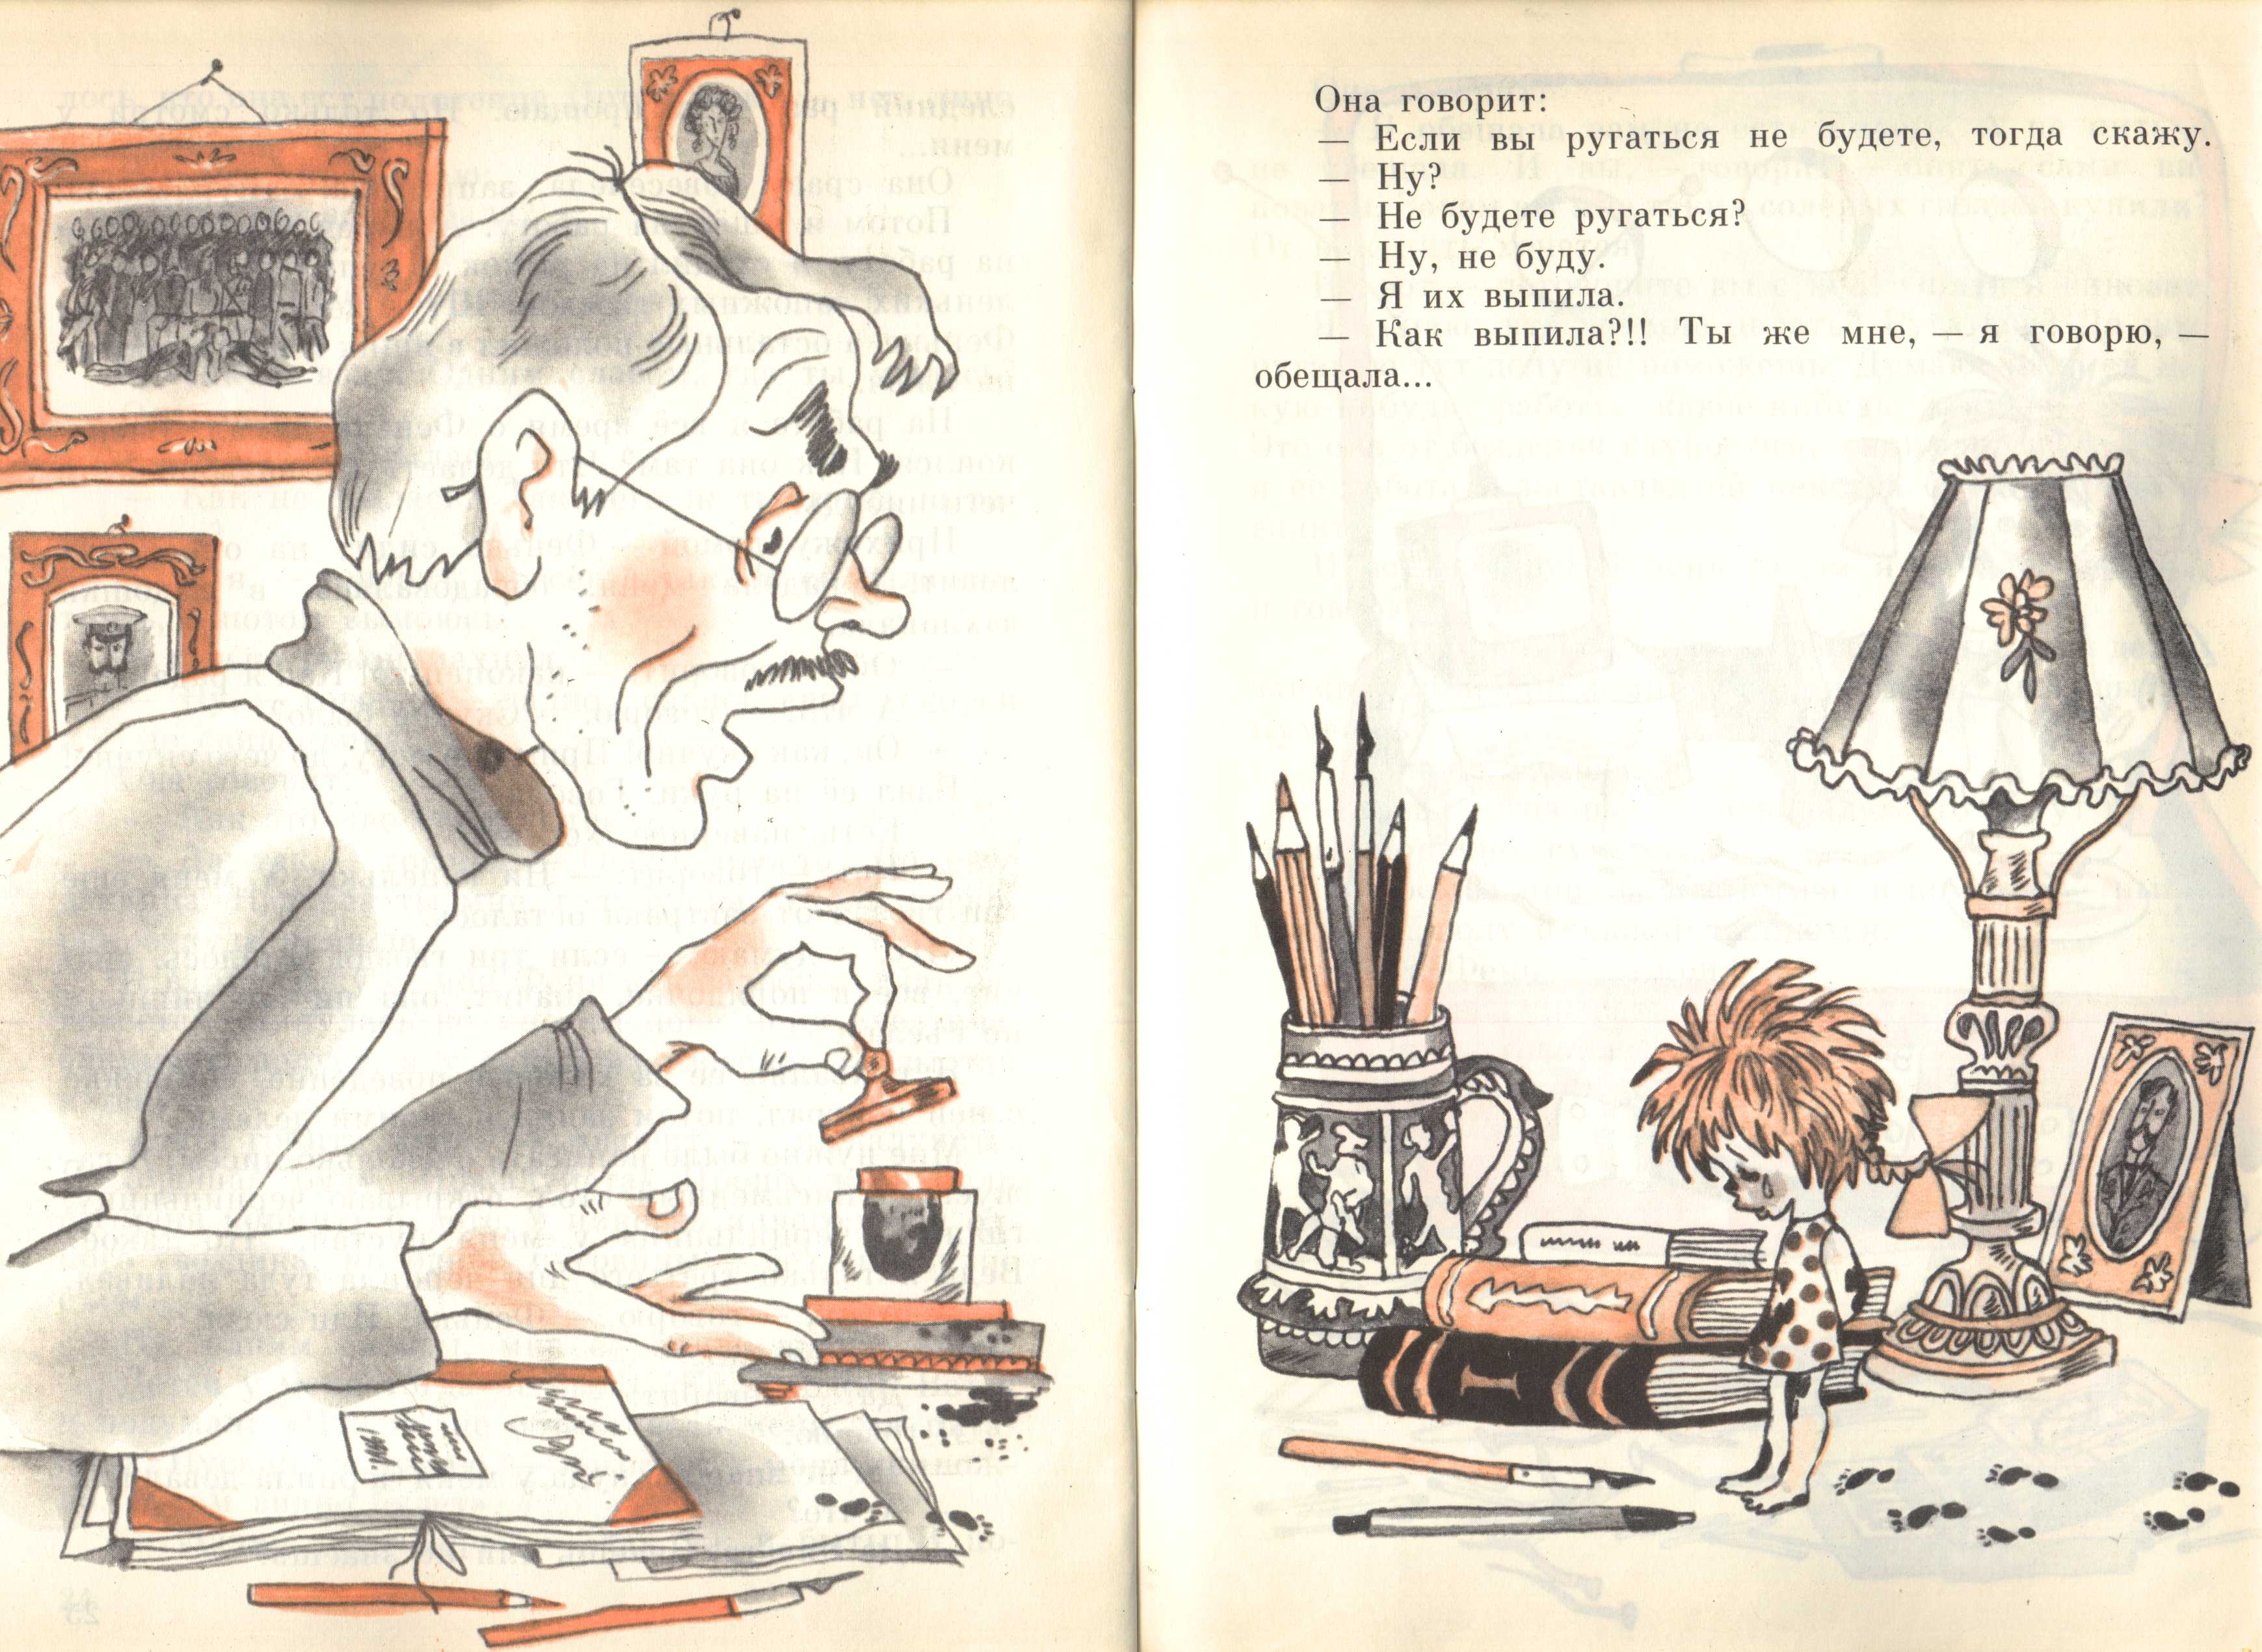 Картинки фенька из рассказа пантелеева карабин тоггл